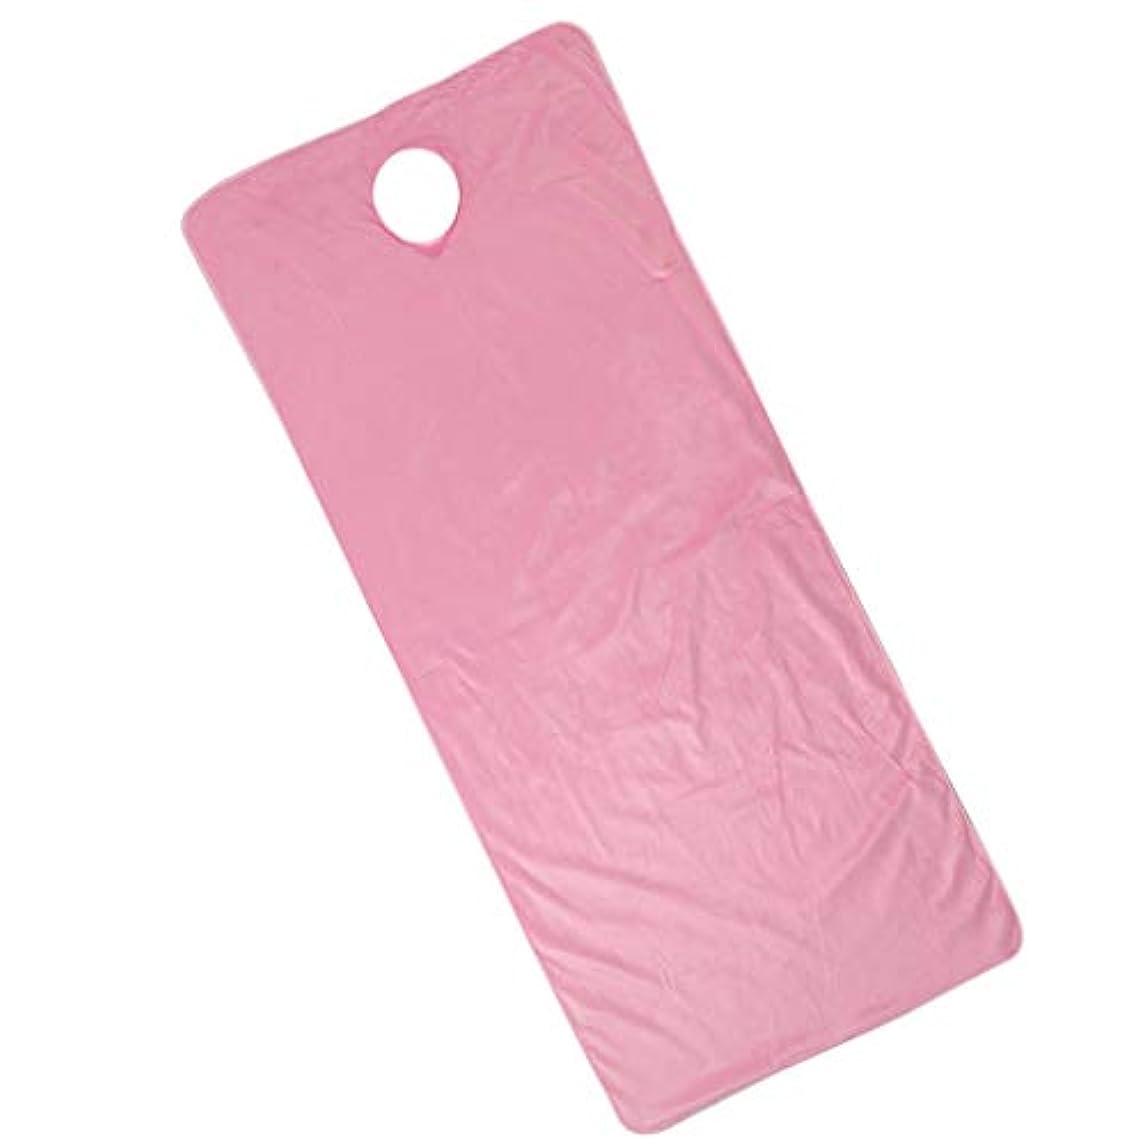 F Fityle 美容ベッドカバー 有孔 スパ マッサージベッドカバー ピンク